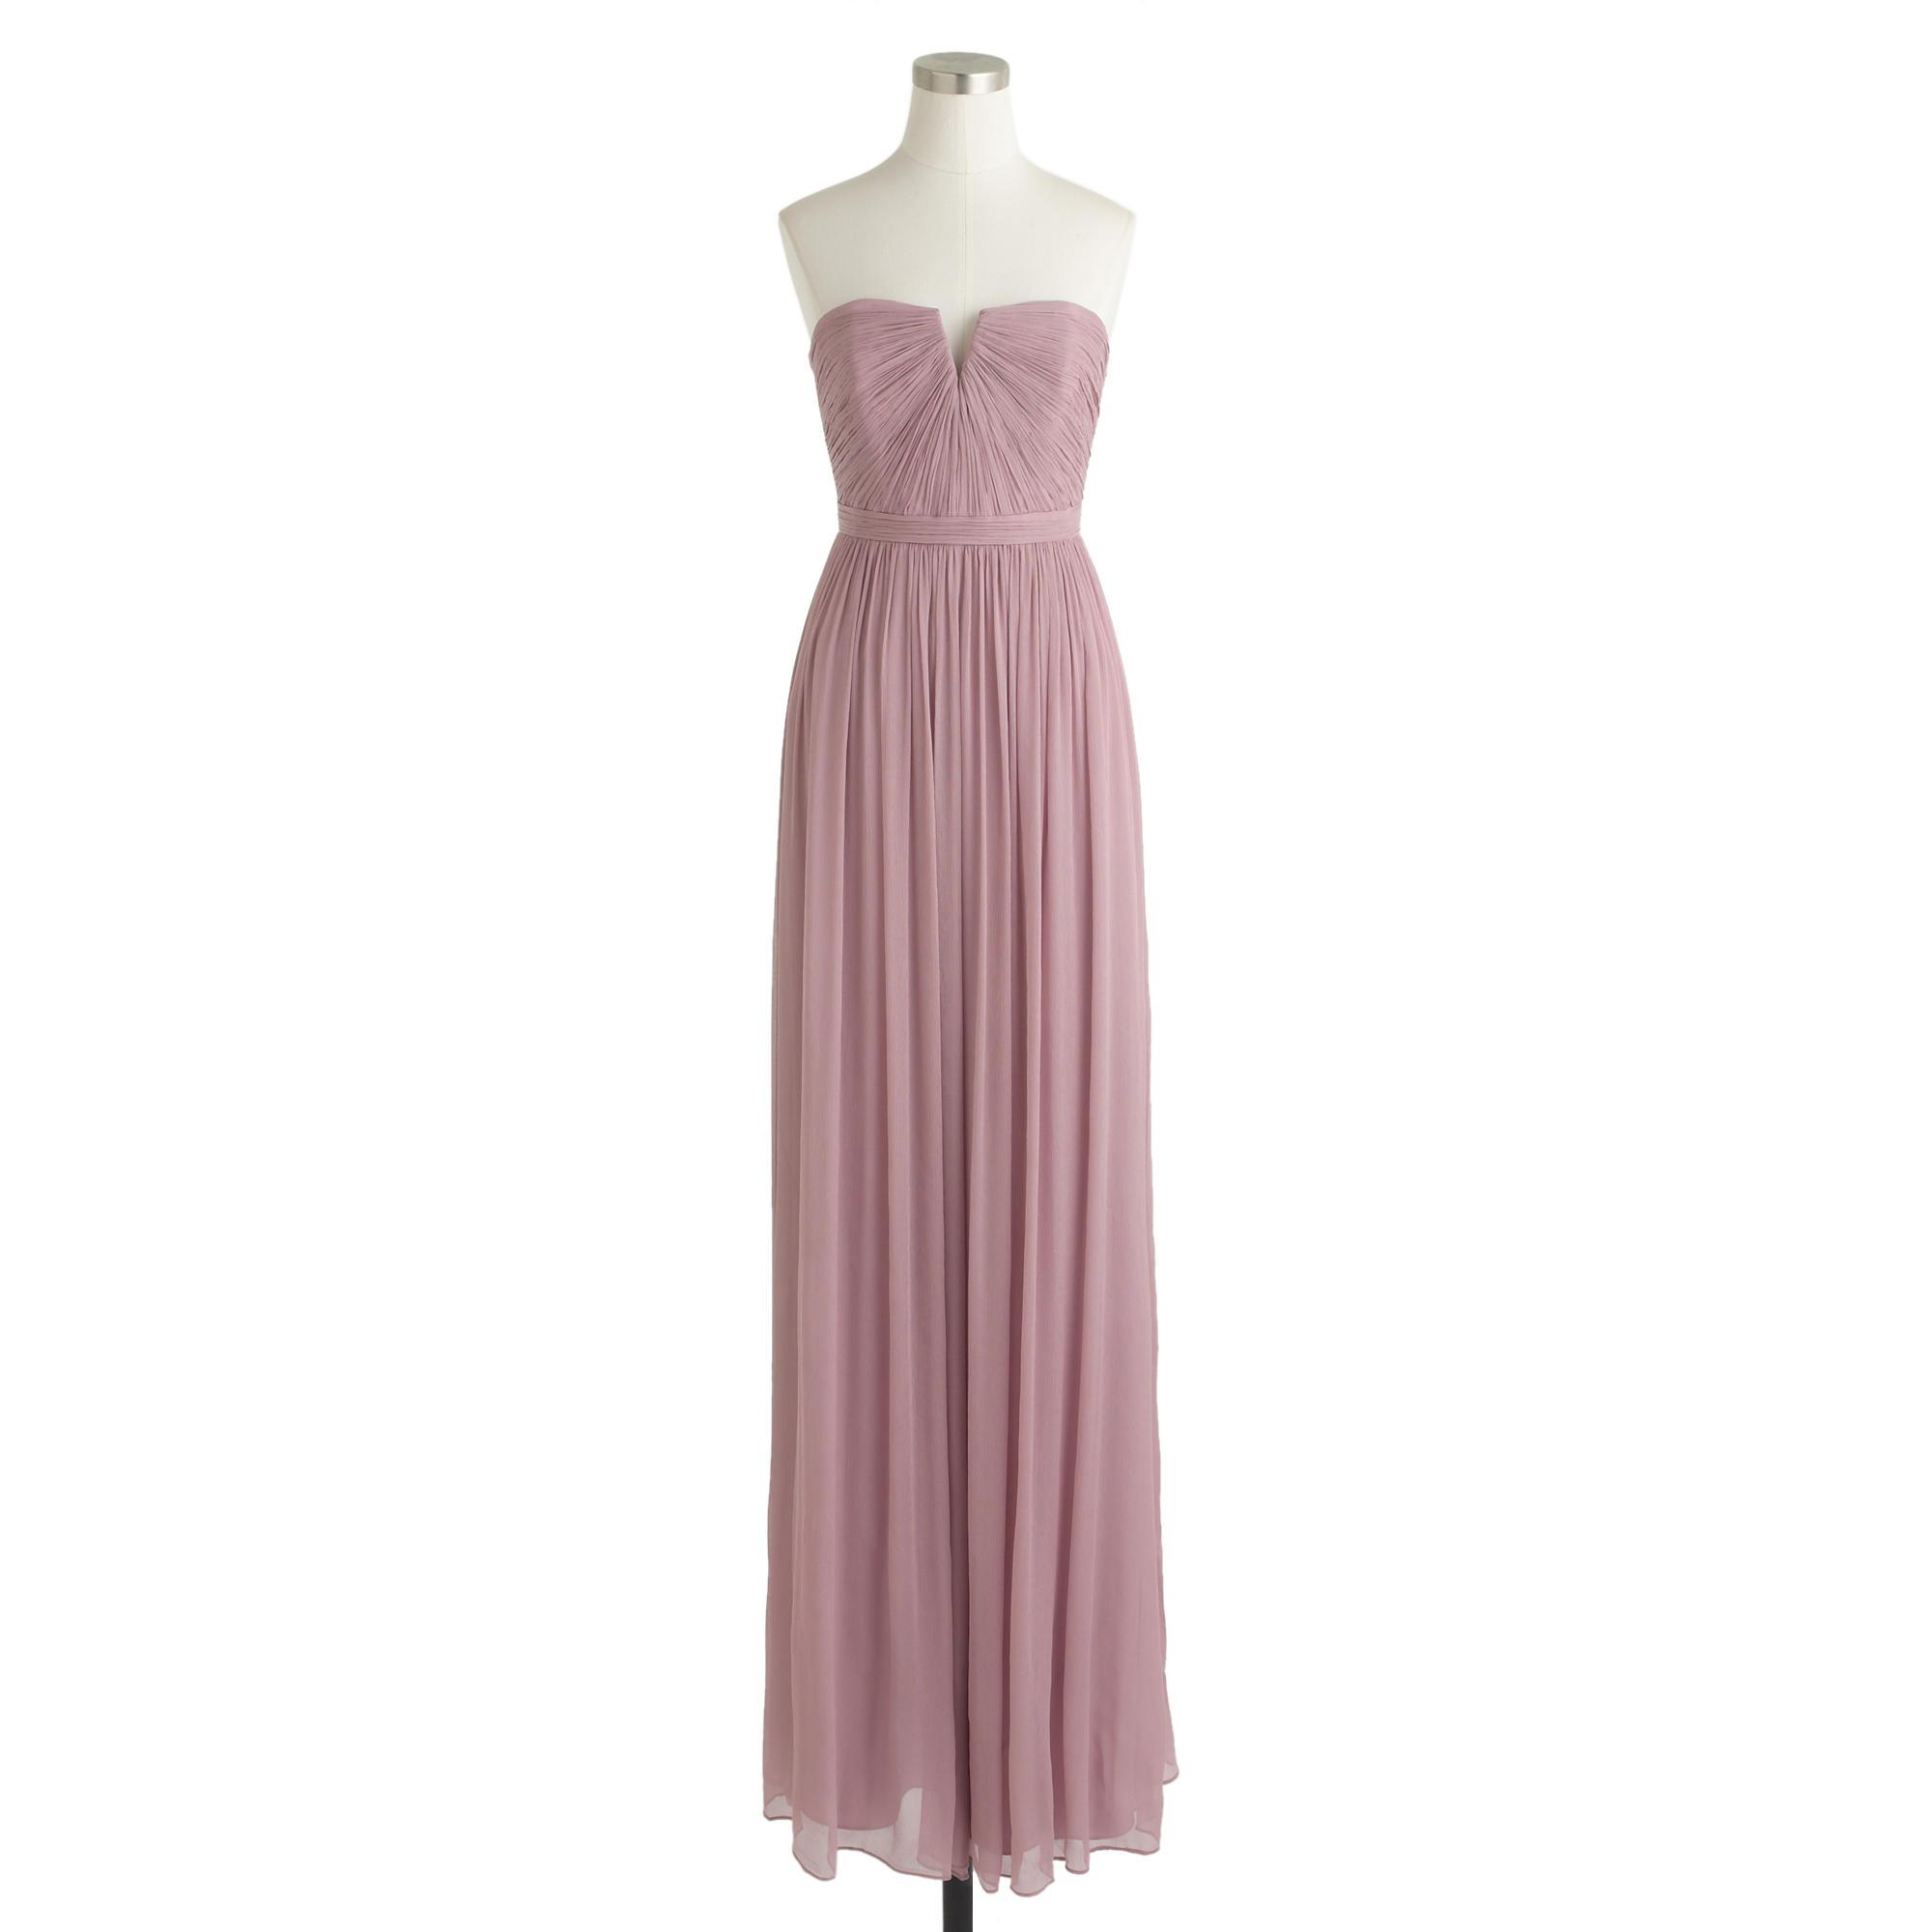 2400217034e1 J.Crew Nadia Long Dress In Silk Chiffon in Pink - Lyst